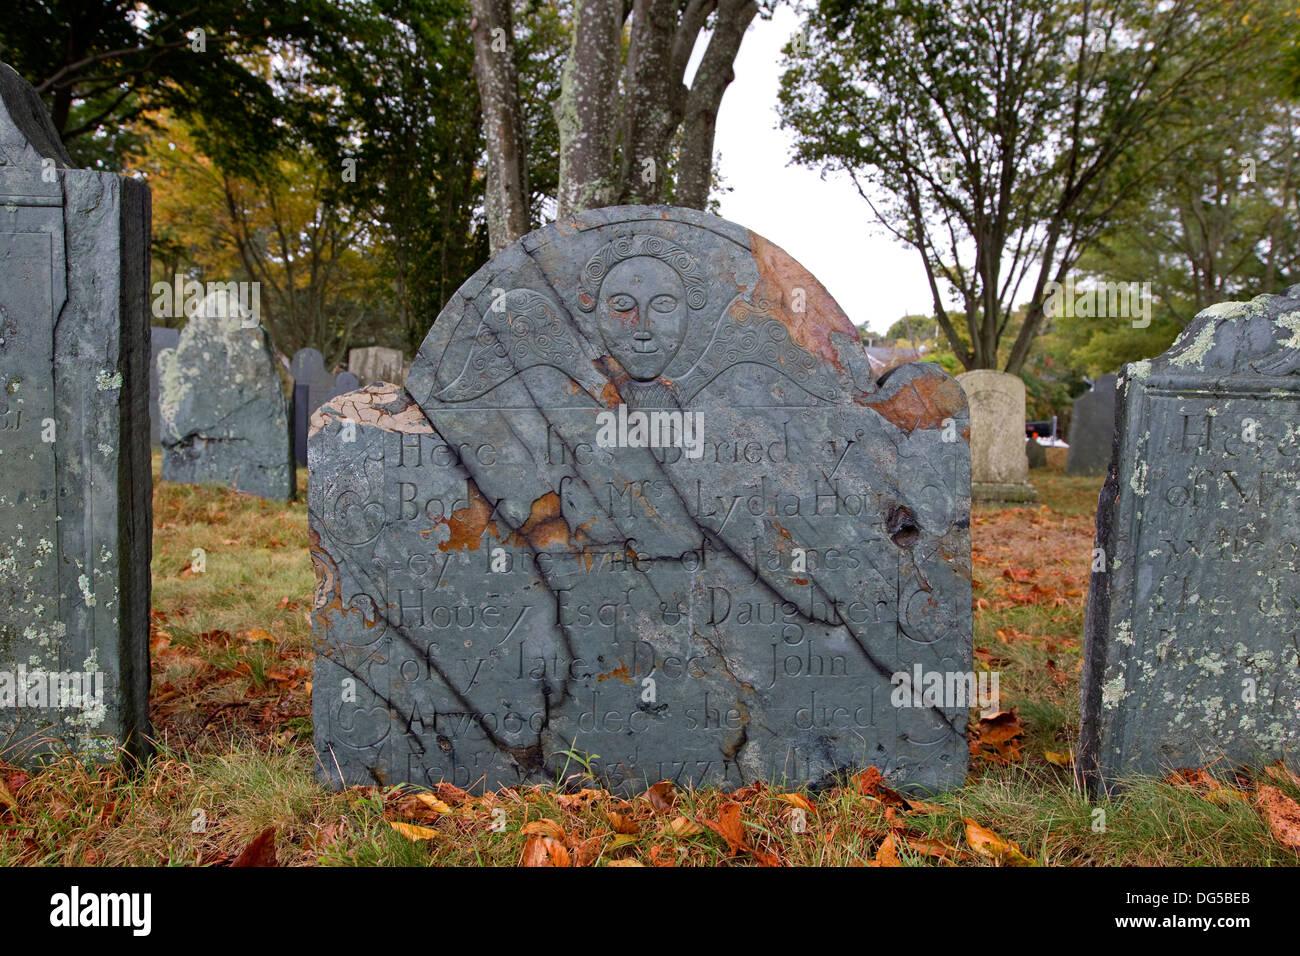 Old New England cemetery gravestone, headstone, Plymouth Rock, Massachusetts in autumn - Stock Image